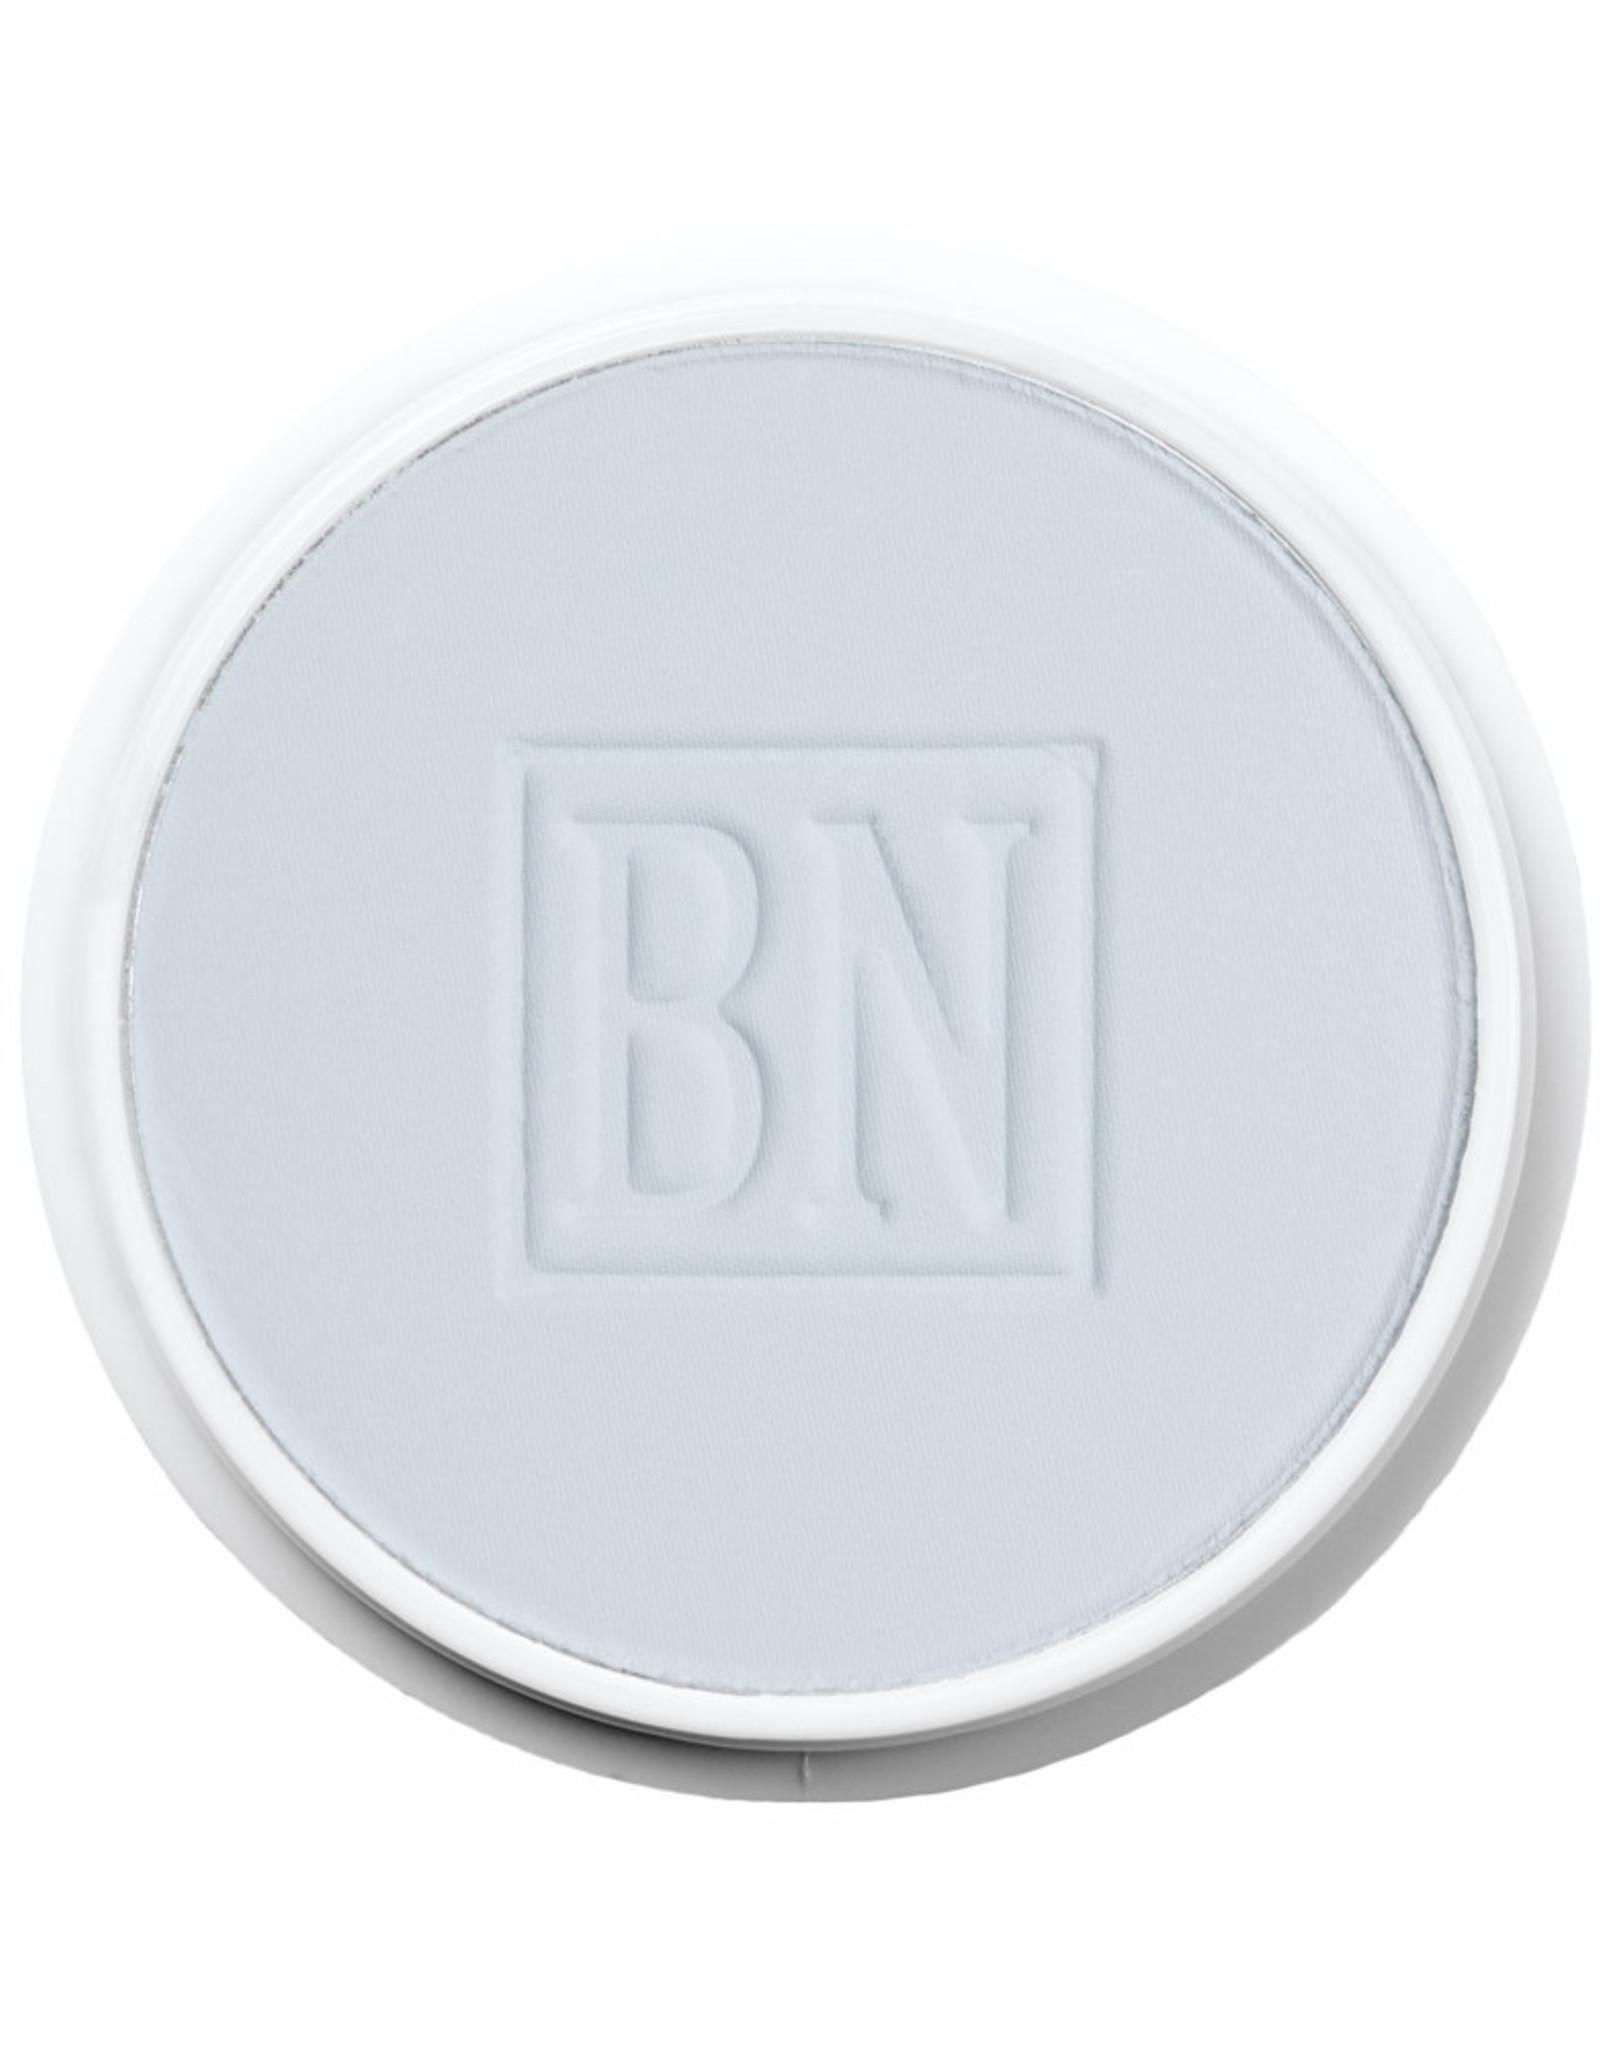 Ben Nye FOUNDATION-CAKE, BLUE SPIRIT, 1 OZ